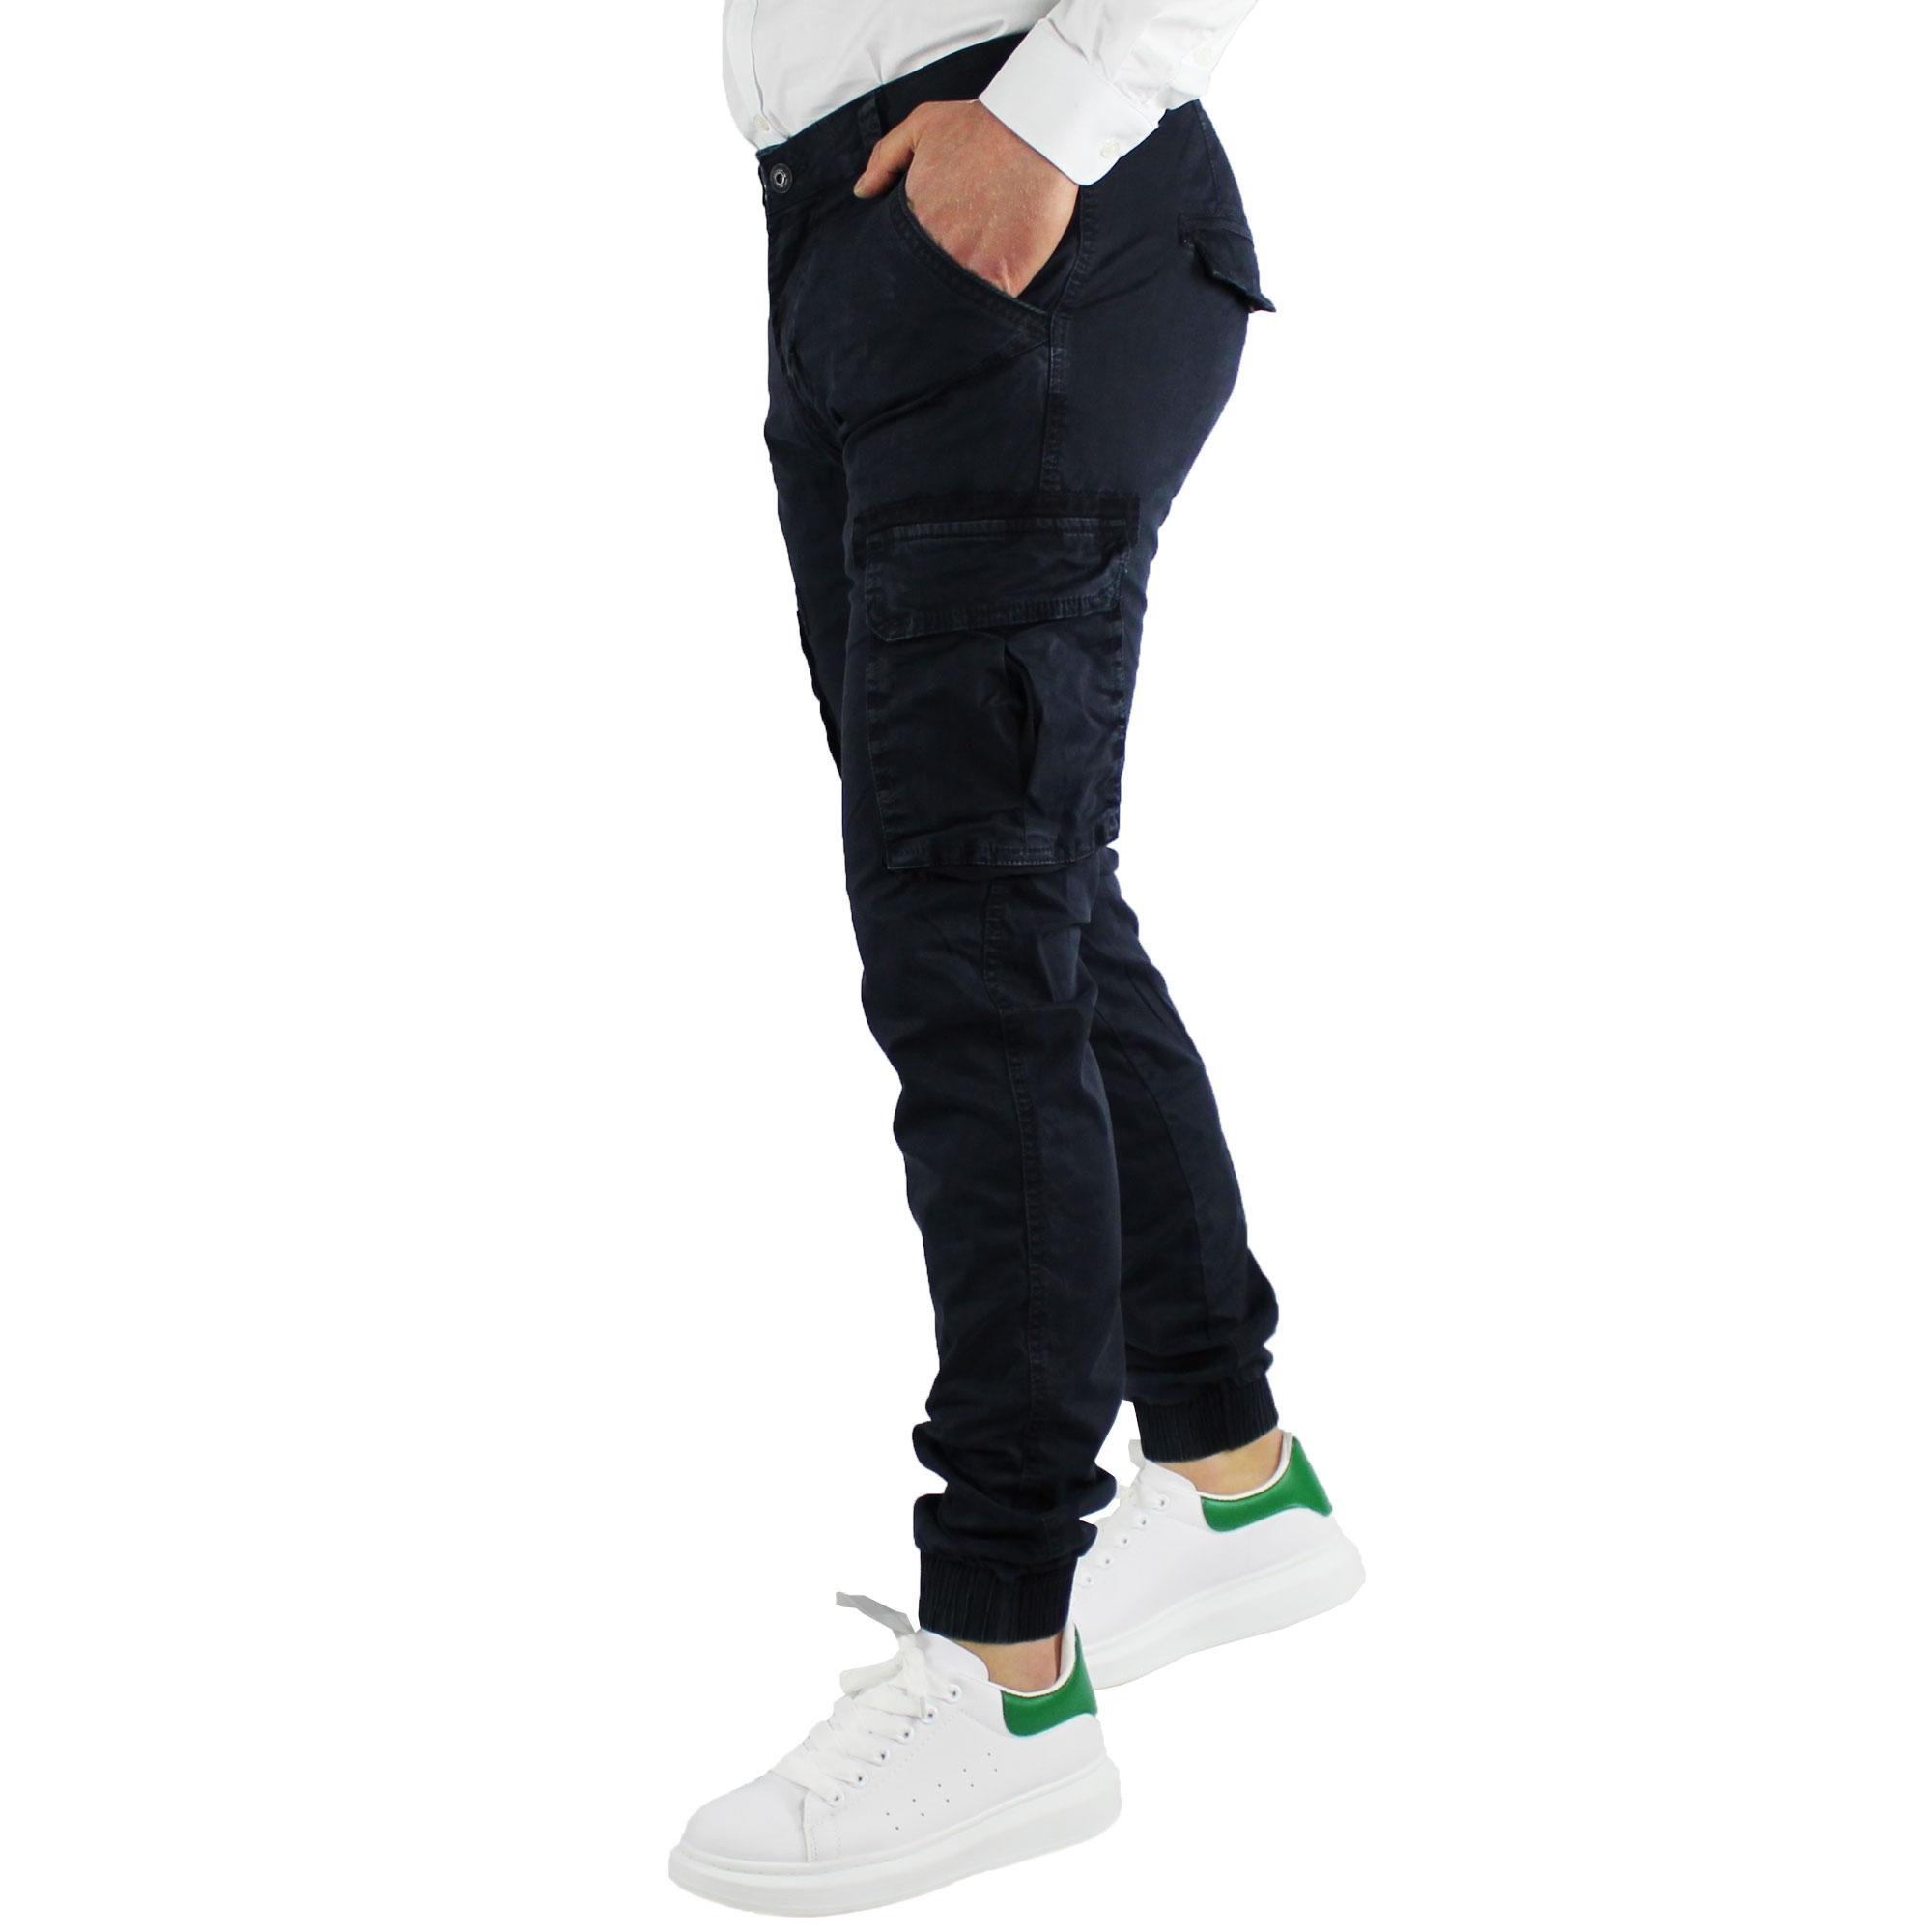 Pantaloni-Uomo-Cargo-Invernali-Pantalone-Tasche-Laterali-SlimFit-Verde-Blu-Fango miniatura 4